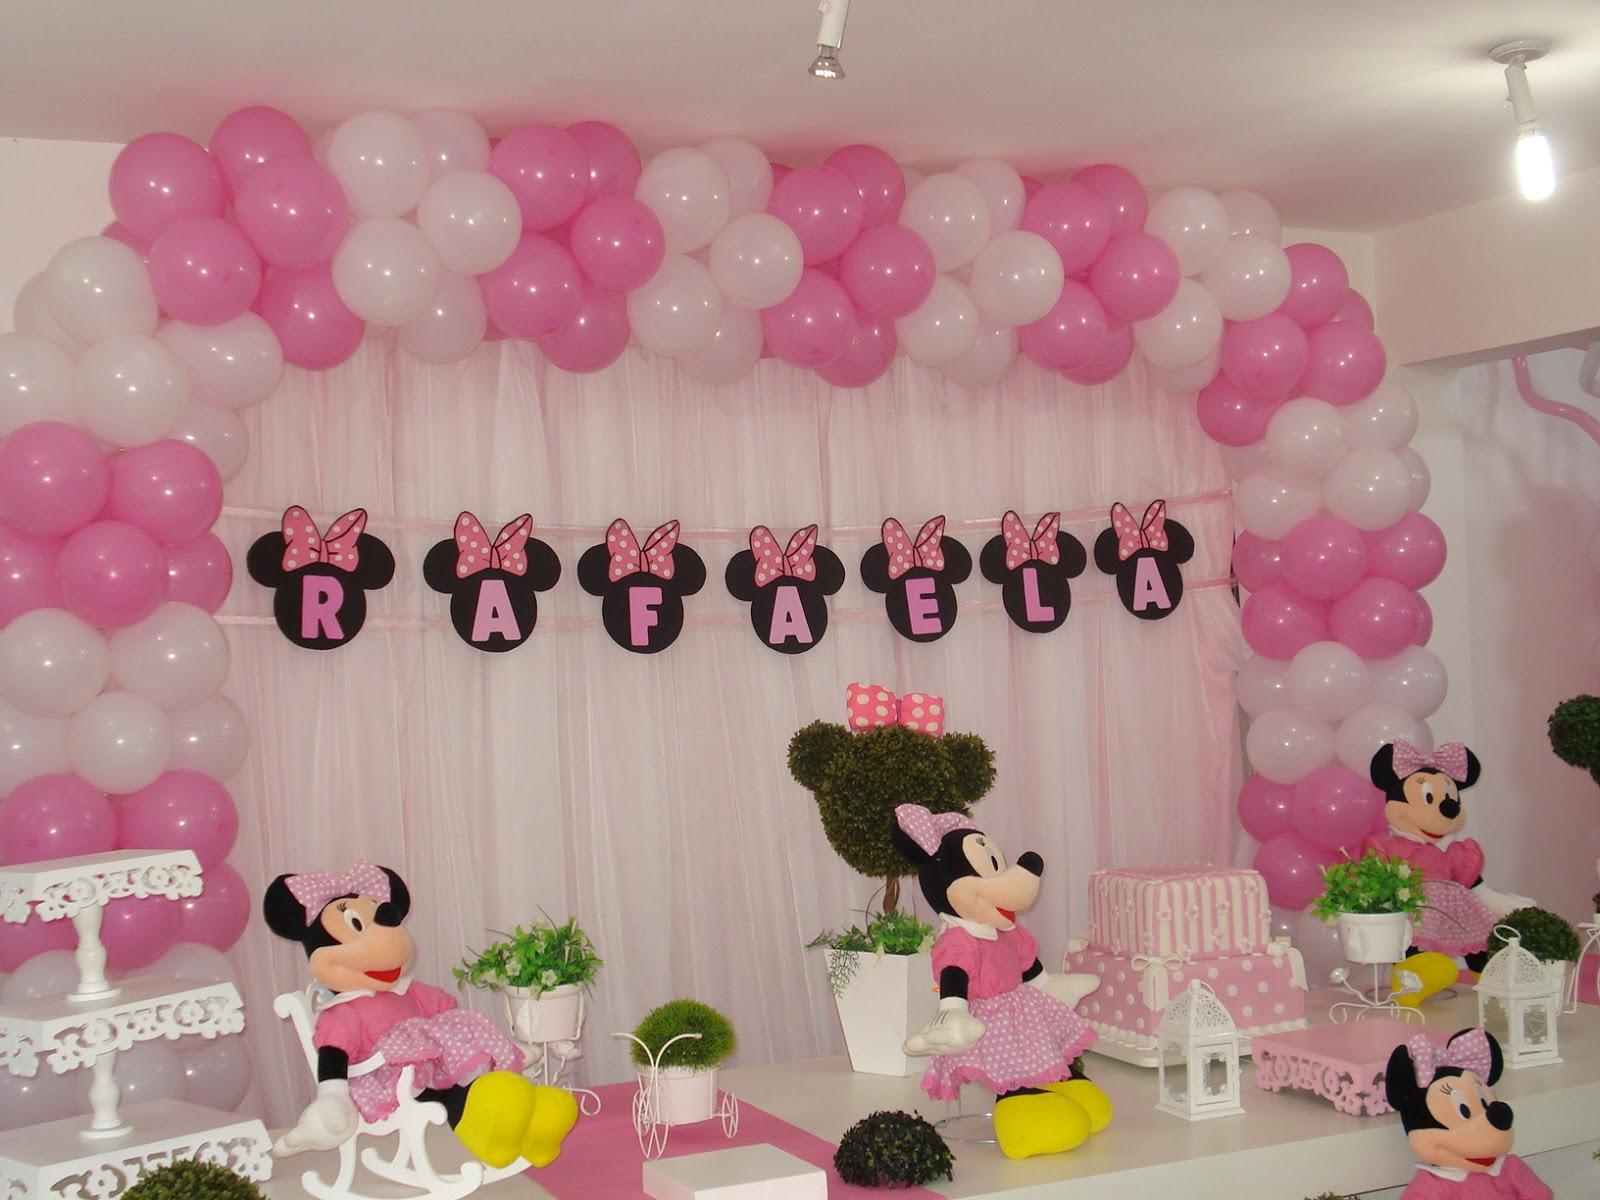 decoracao festa minnie rosa:Raul & Ricardo Festas: Decoração Minie Rosa – Raul & Ricardo Festas